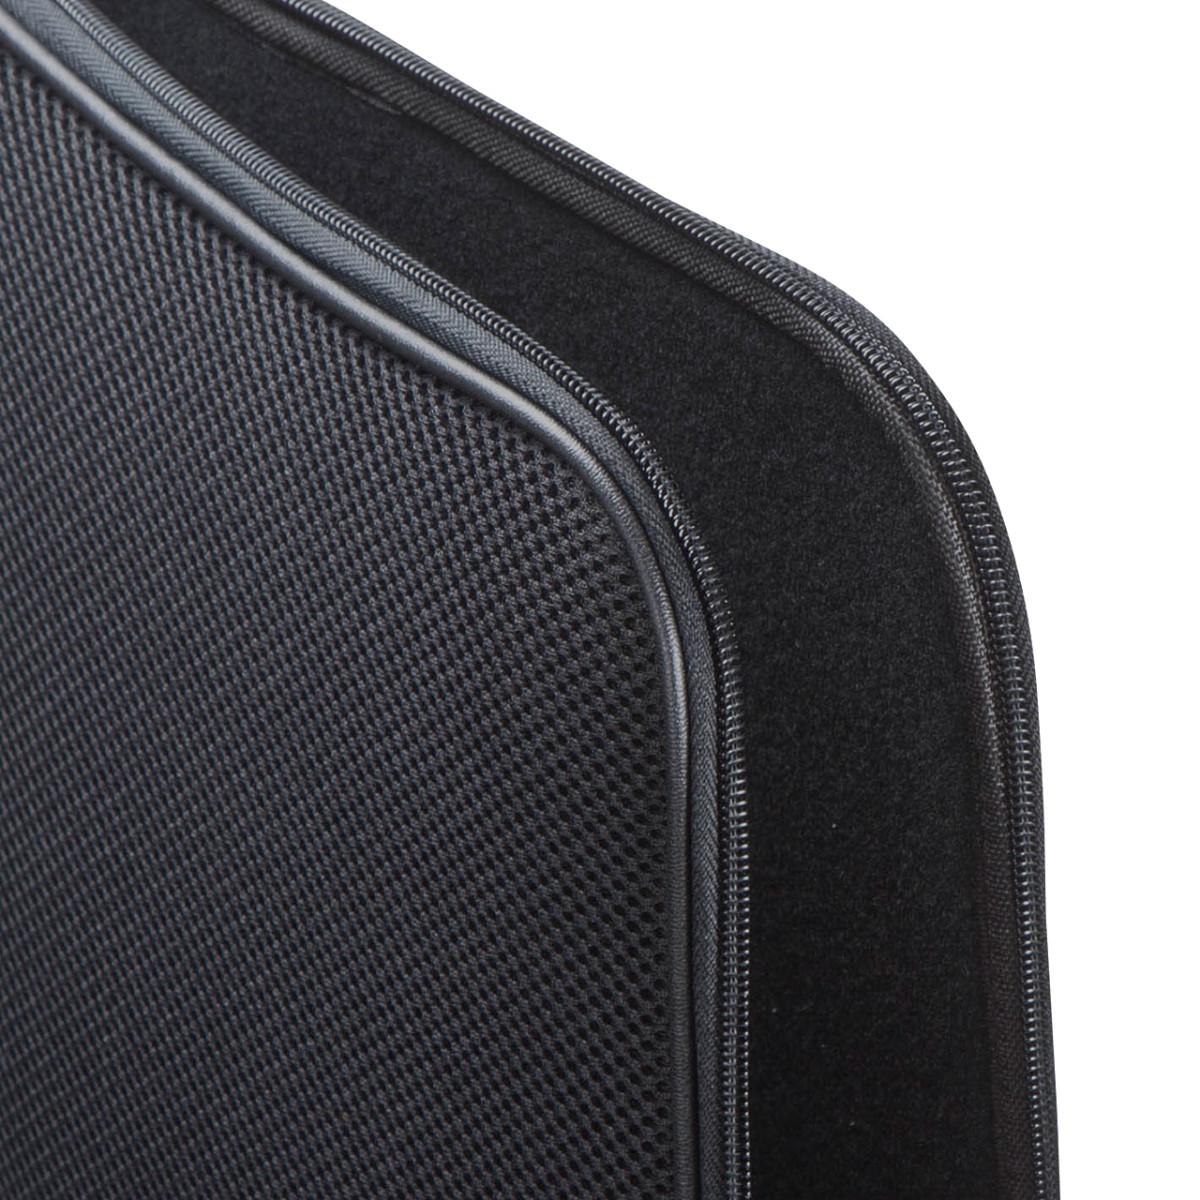 [IN-SG12BK] 【代引き不可】低反発3Dメッシュケース(12.1インチ対応・ブラック)